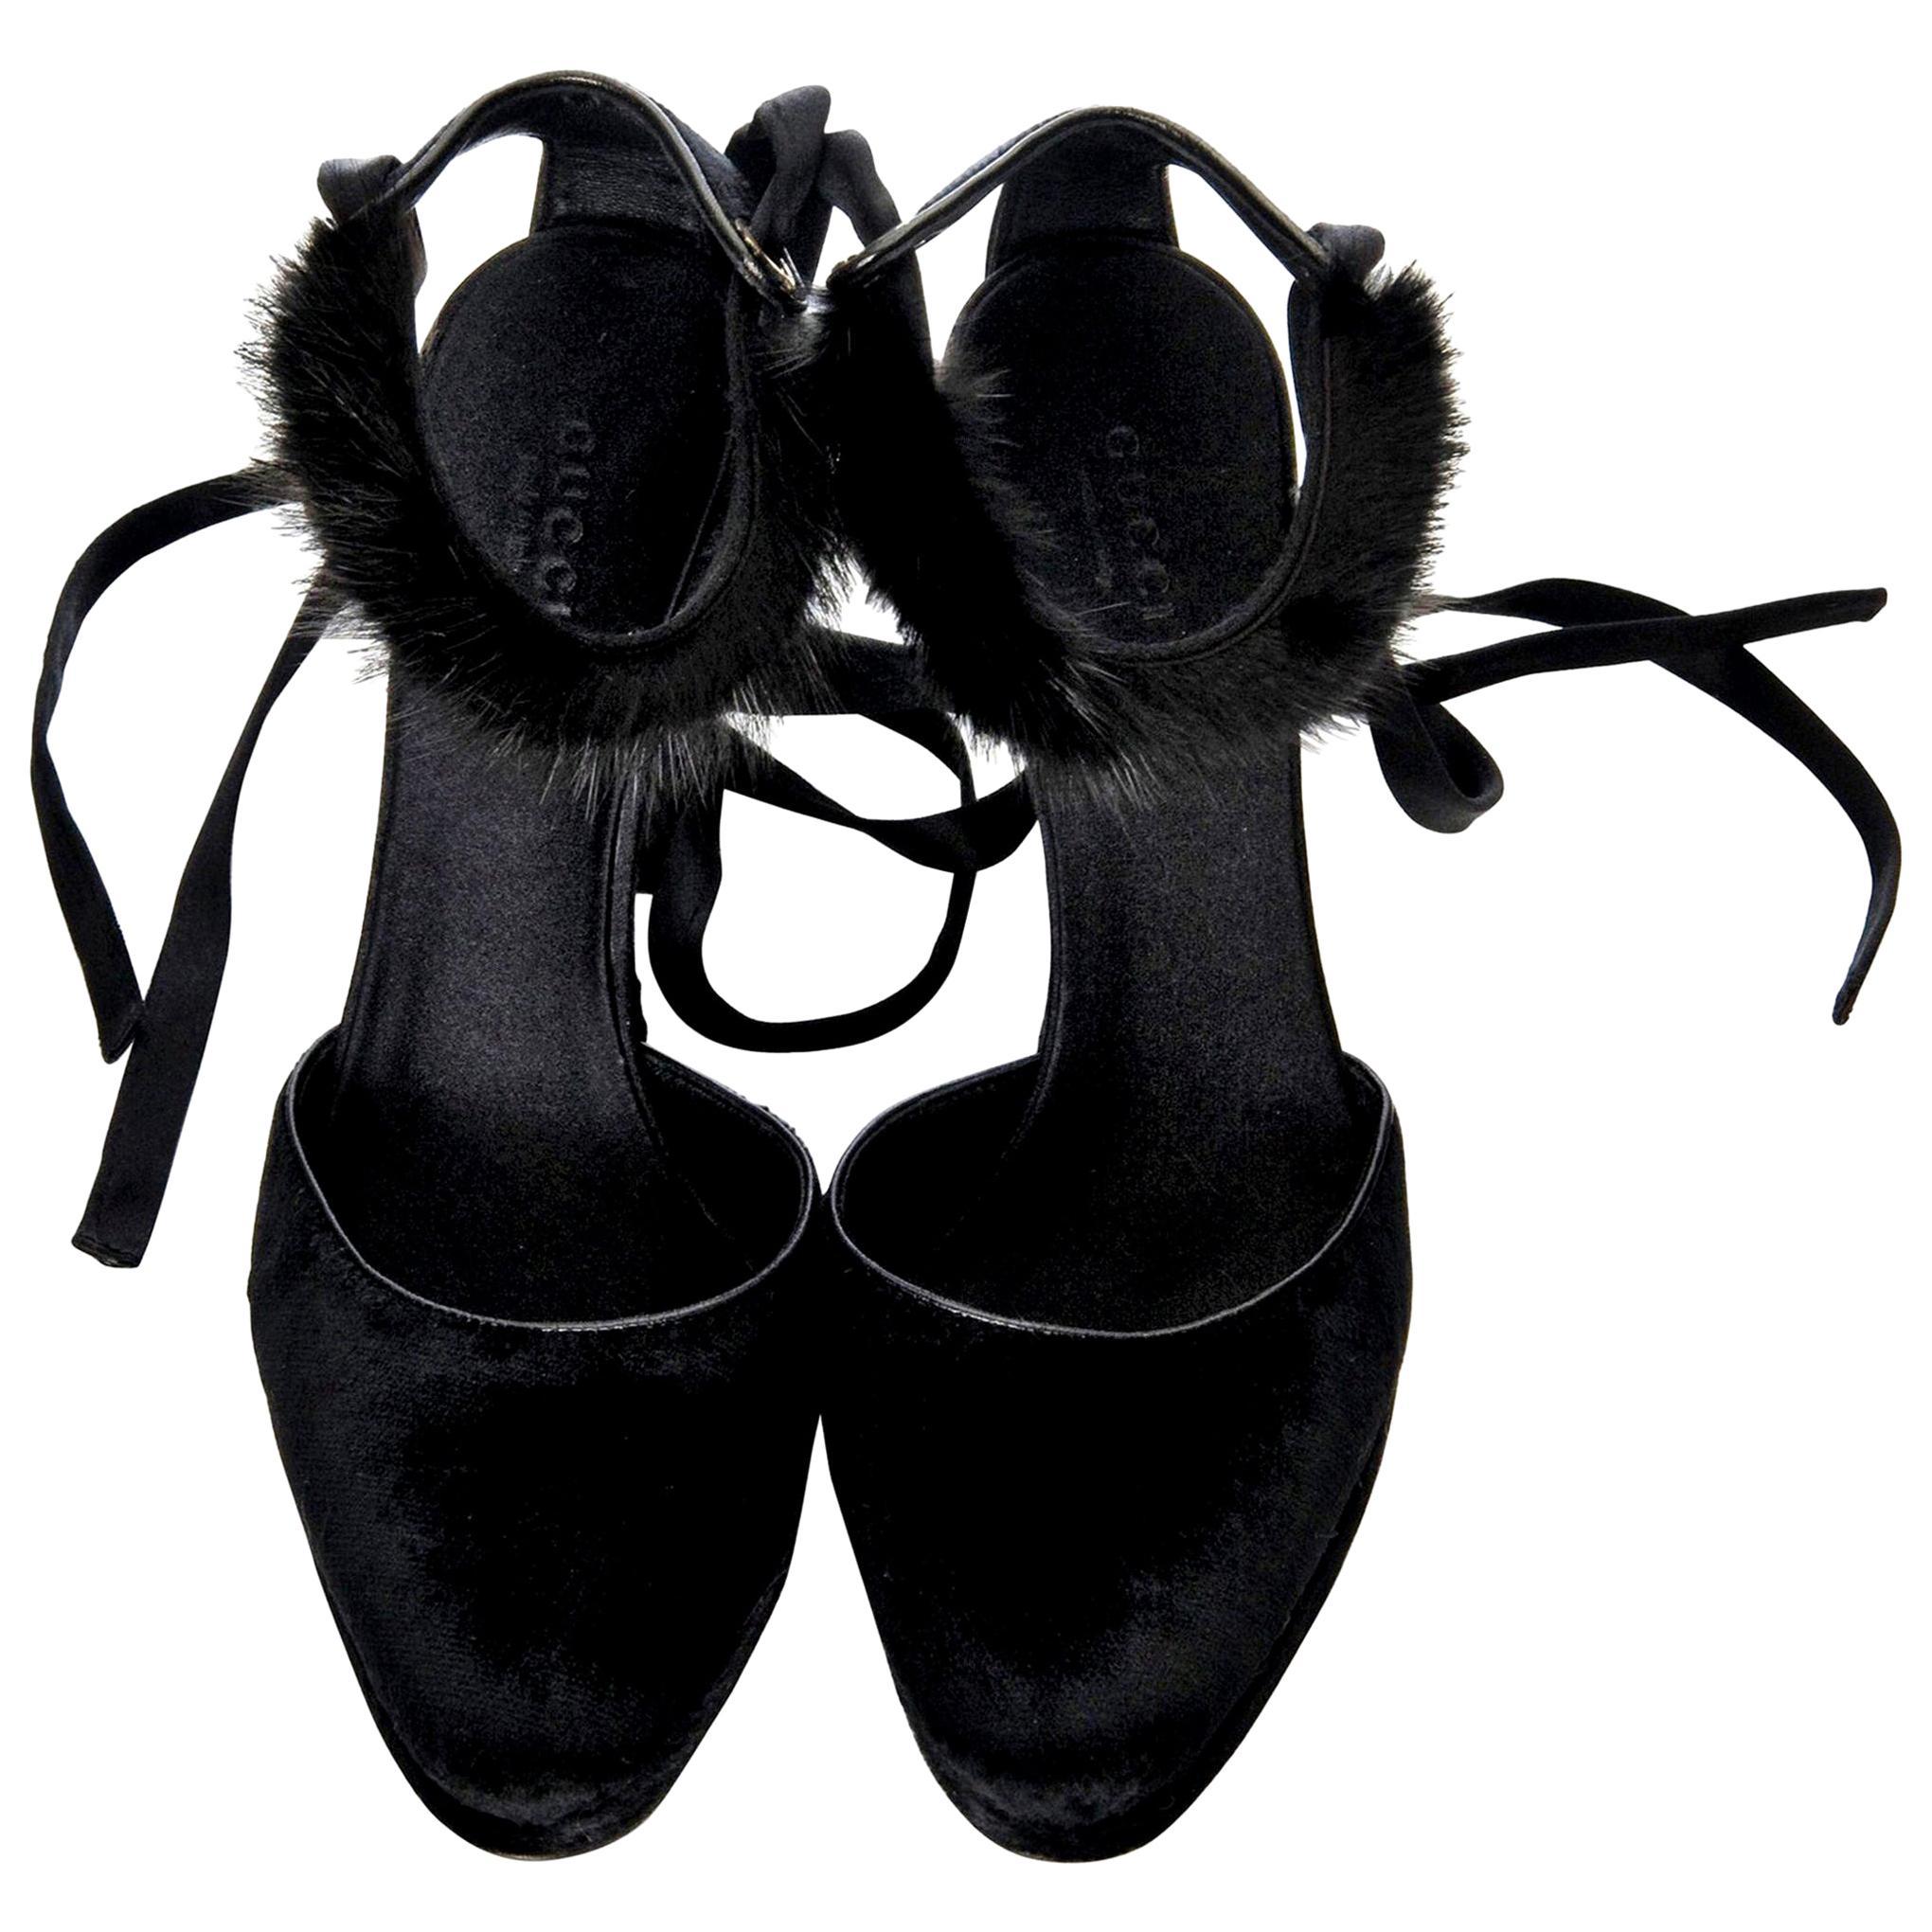 New Tom Ford For Gucci Mink Python Velvet 2004 Final Collection Heels Sz 8.5